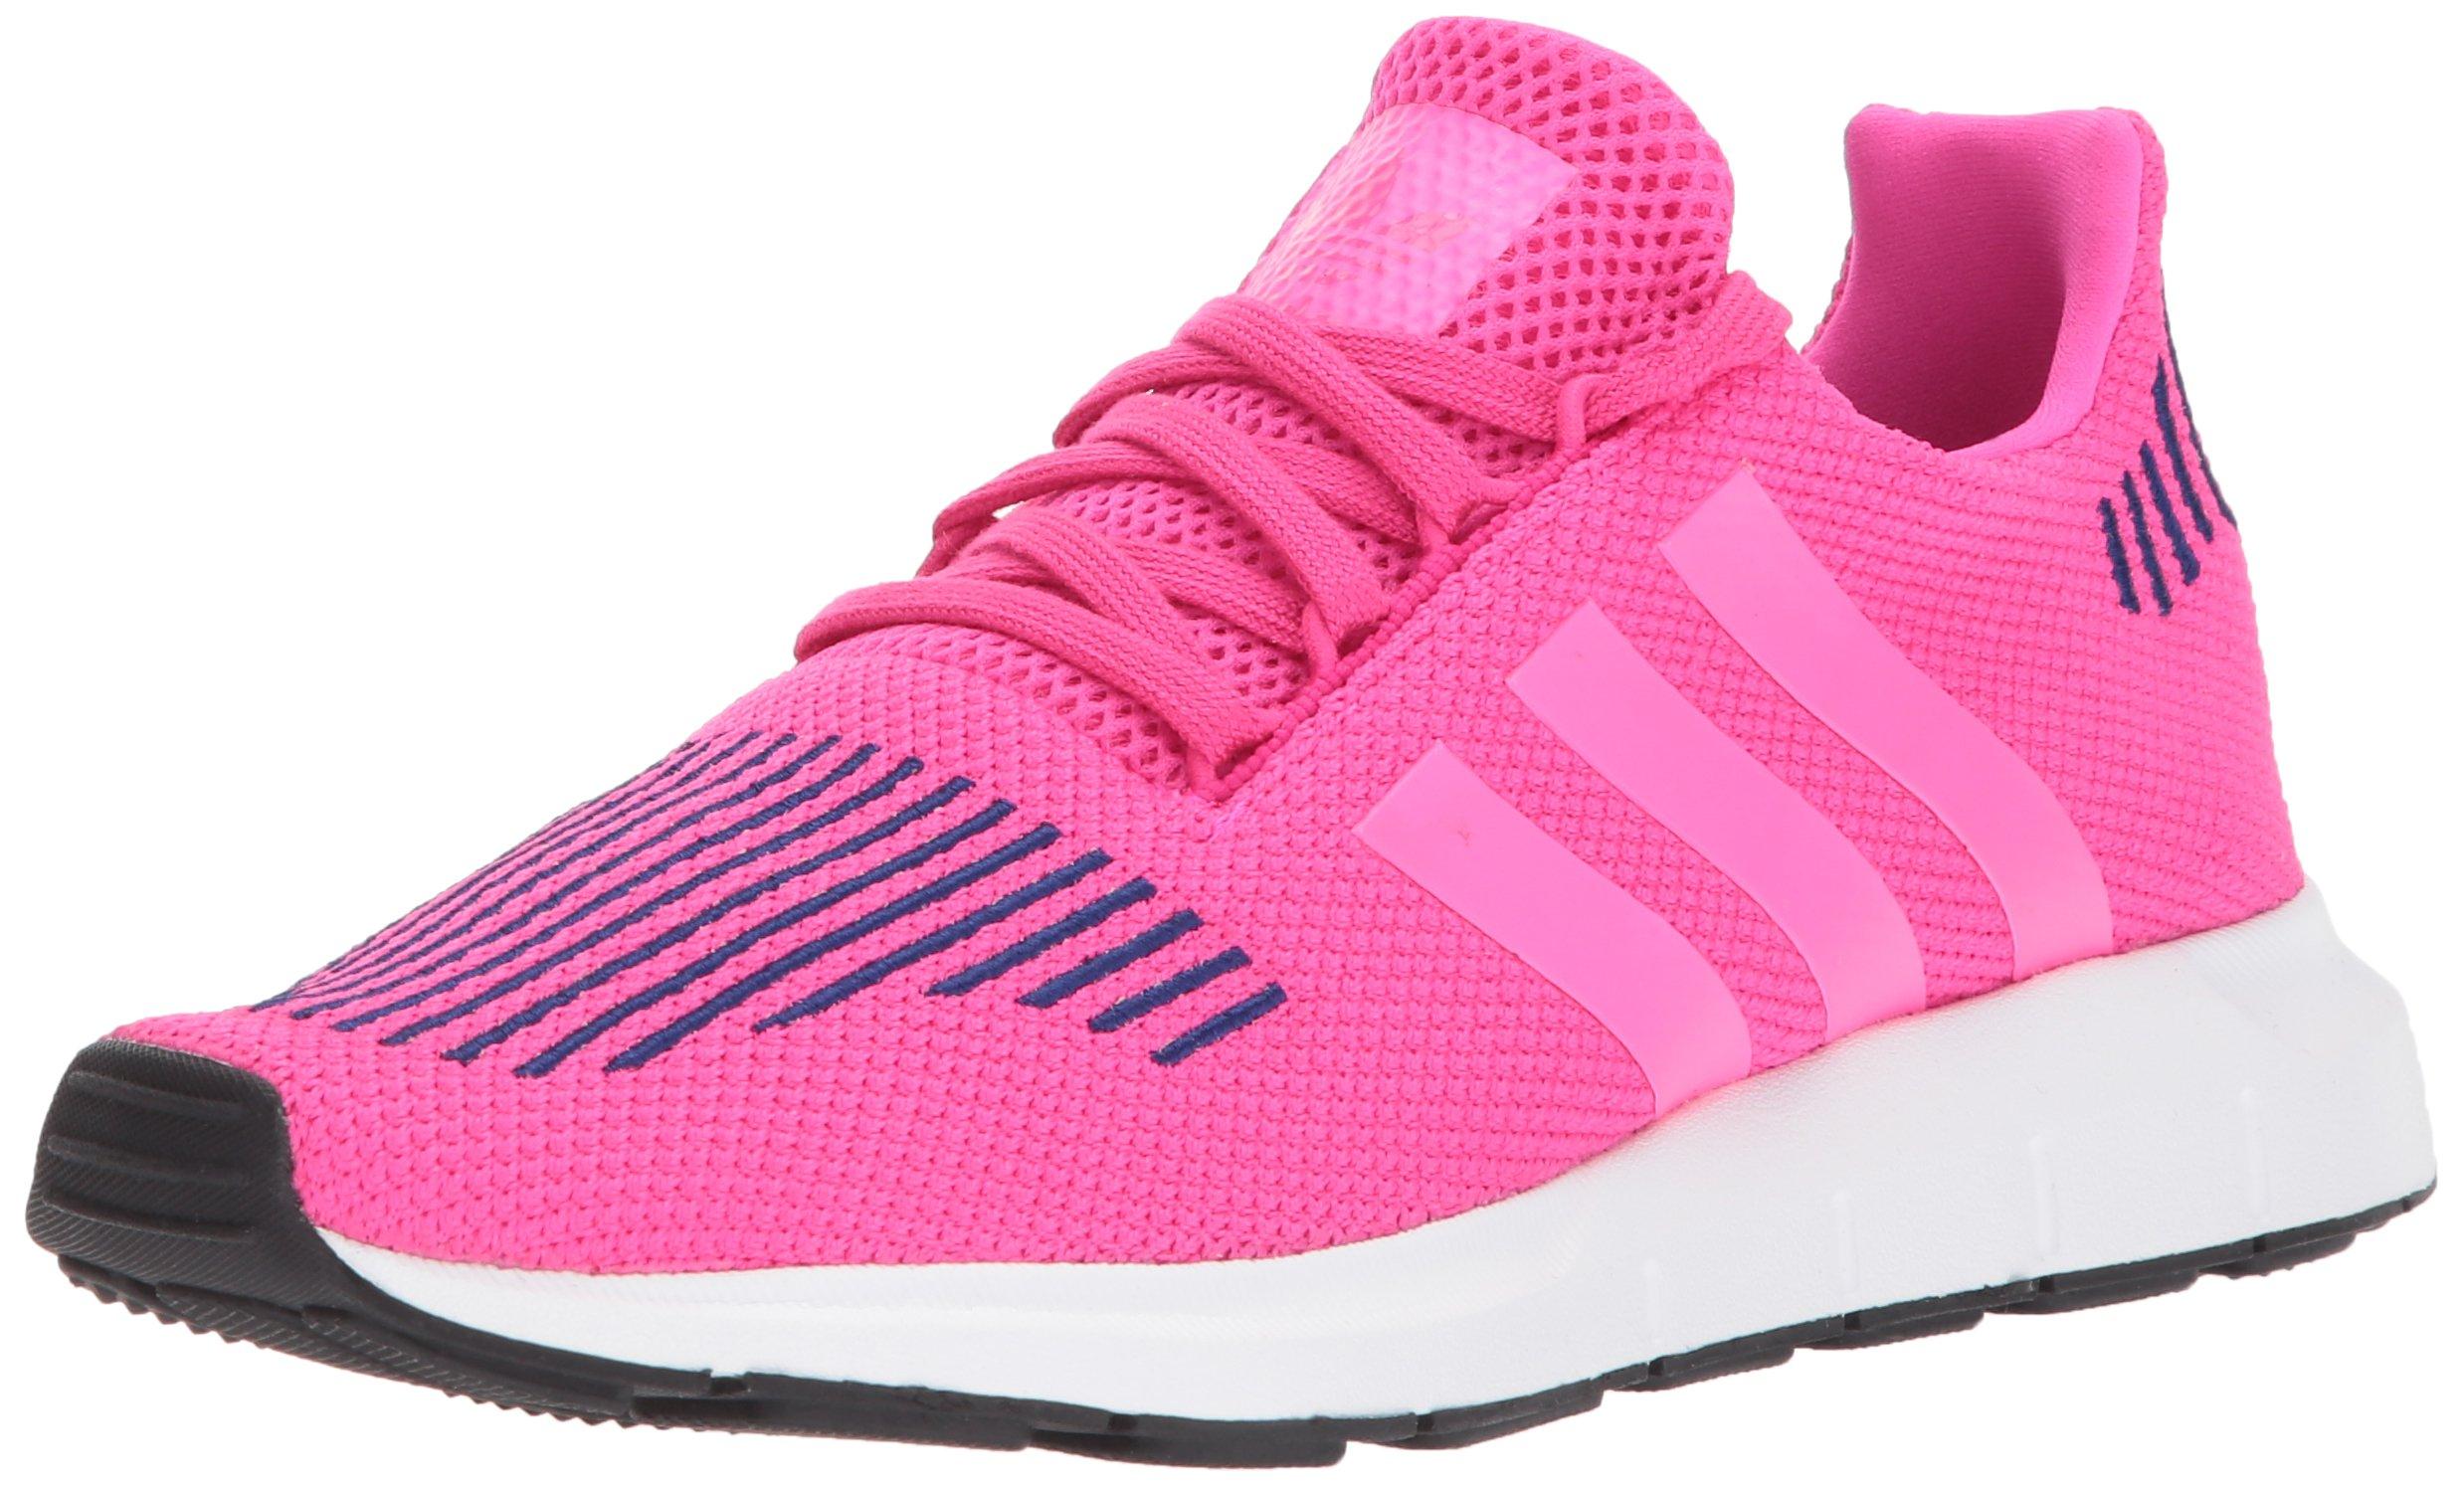 Pink ShoeShock Swift Adidas Running J Originals Galleon Girls' OTPiXZwku